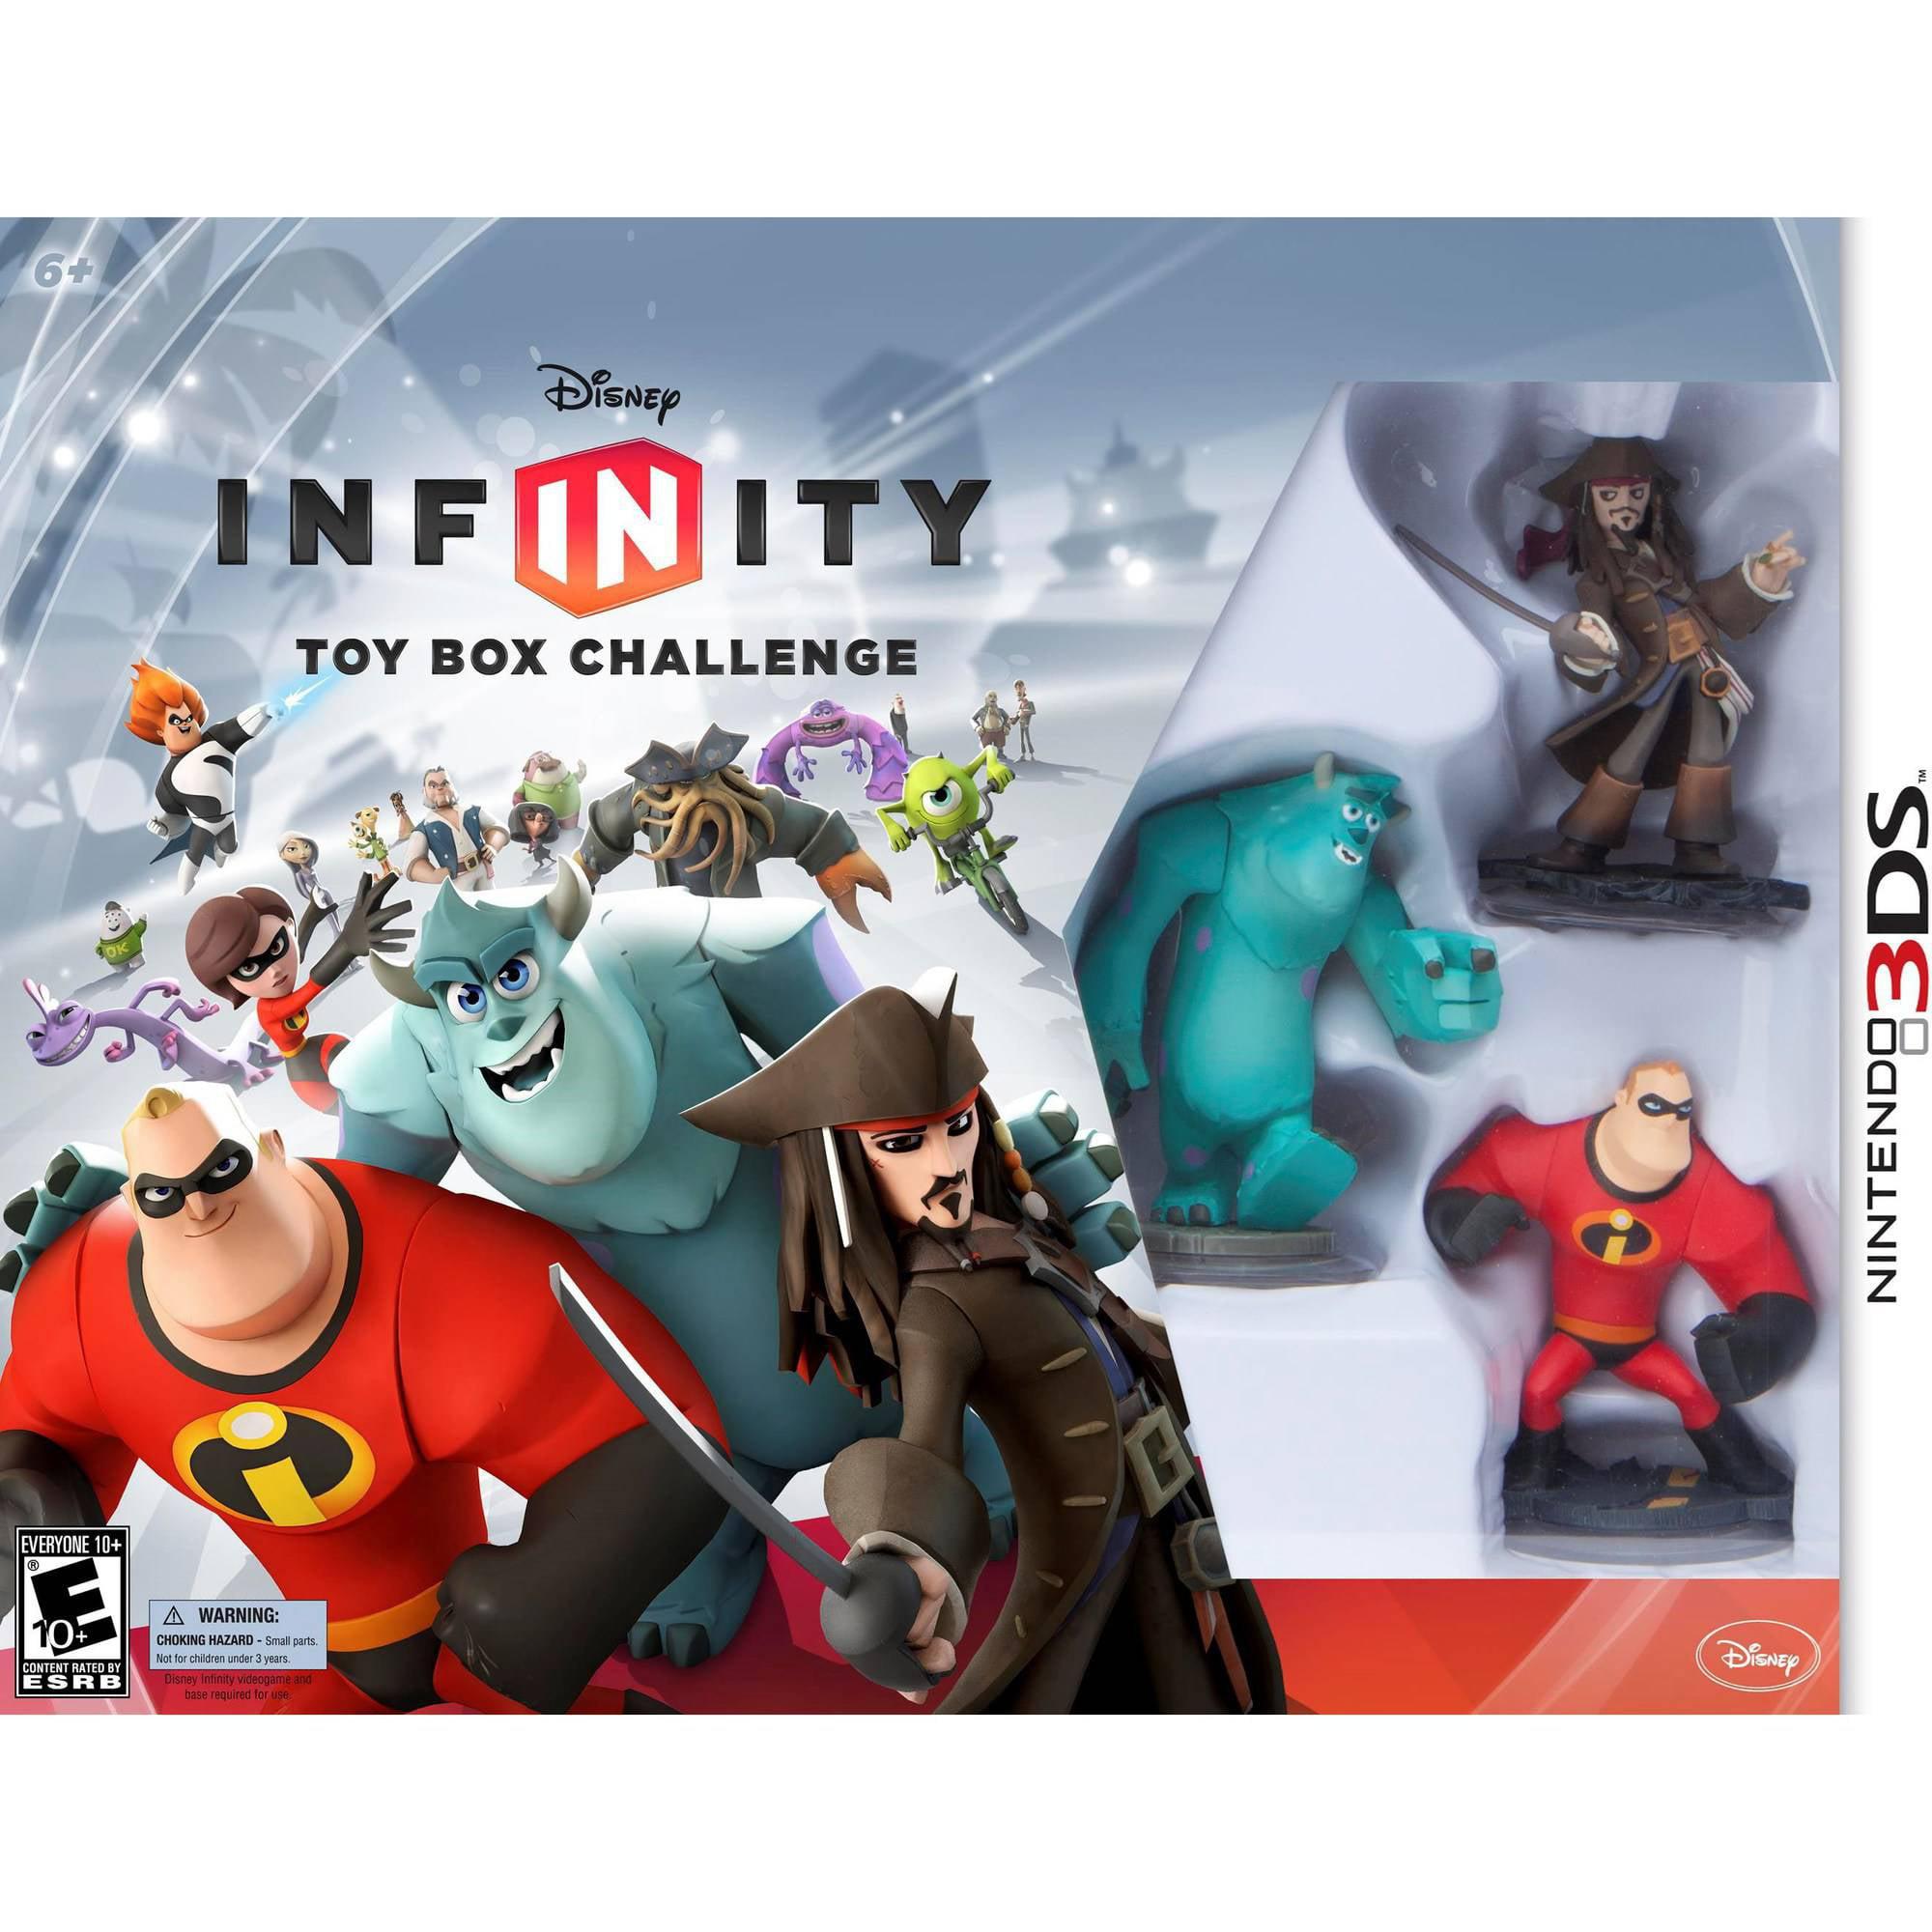 Disney Infinity Toy Box Challenge Starter Pack (Nintendo 3DS)